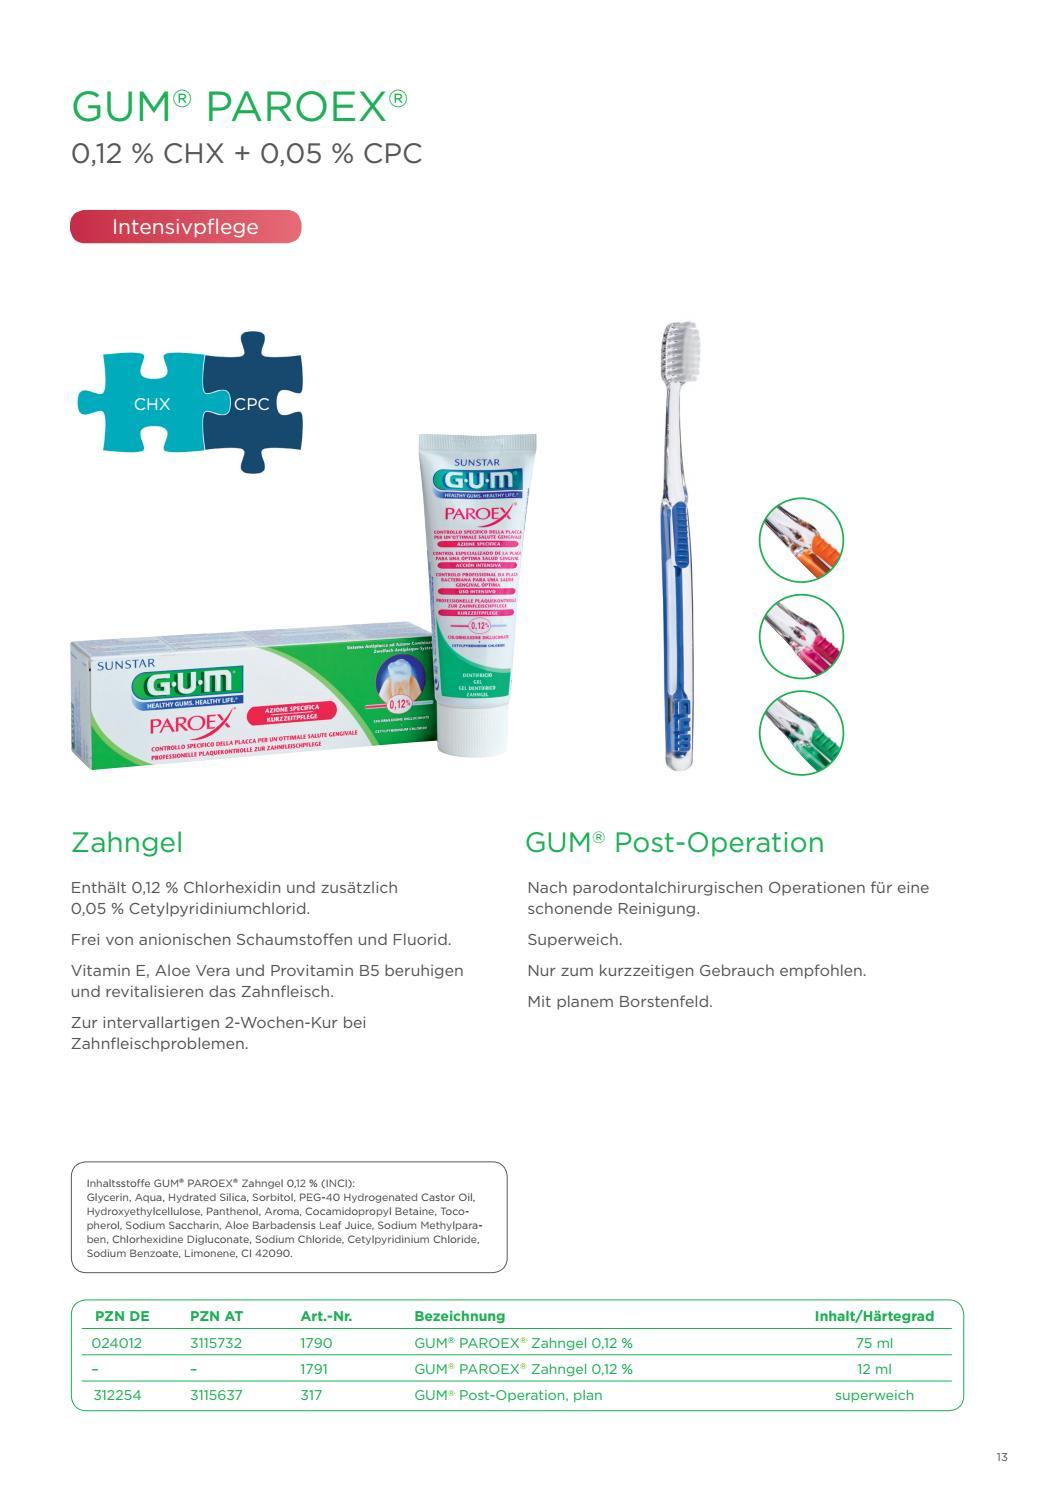 Sunstar Gum Produktkatalog 05 2018 By Tandem Kommunikation Gmbh Issuu Nr Kur Conditioner G Repairs Excessive